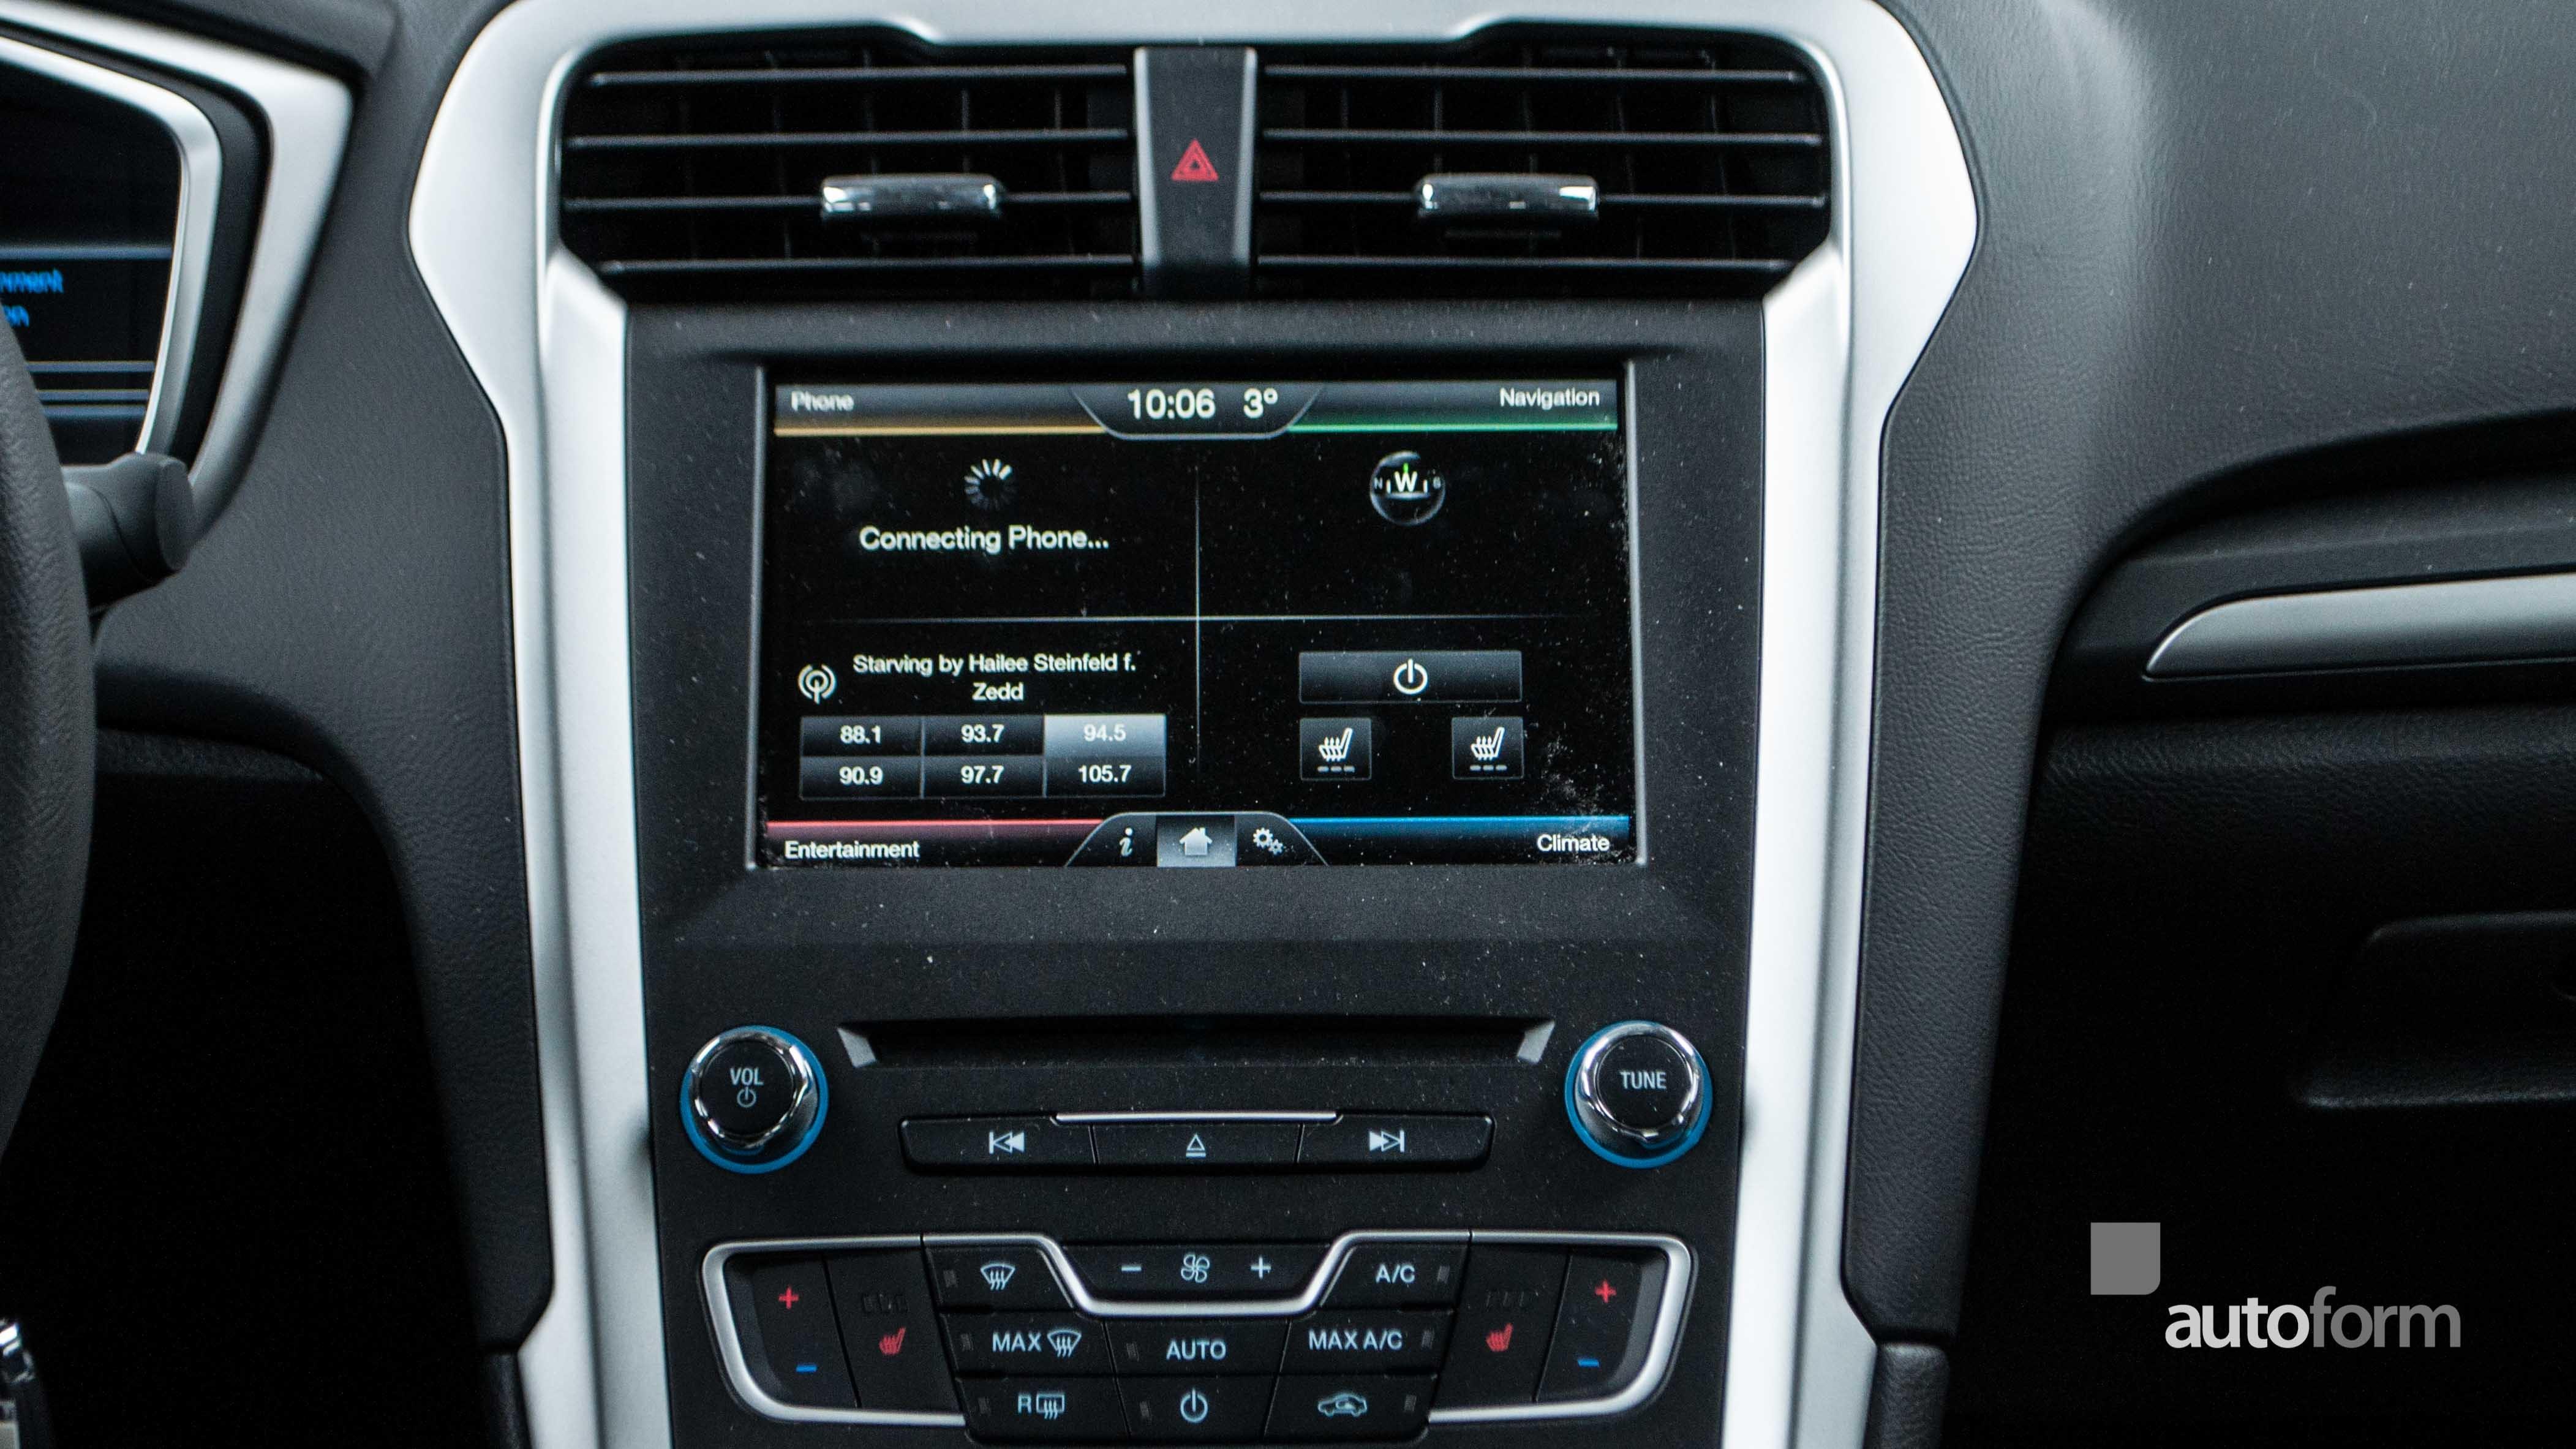 2016 Ford Fusion Autoform